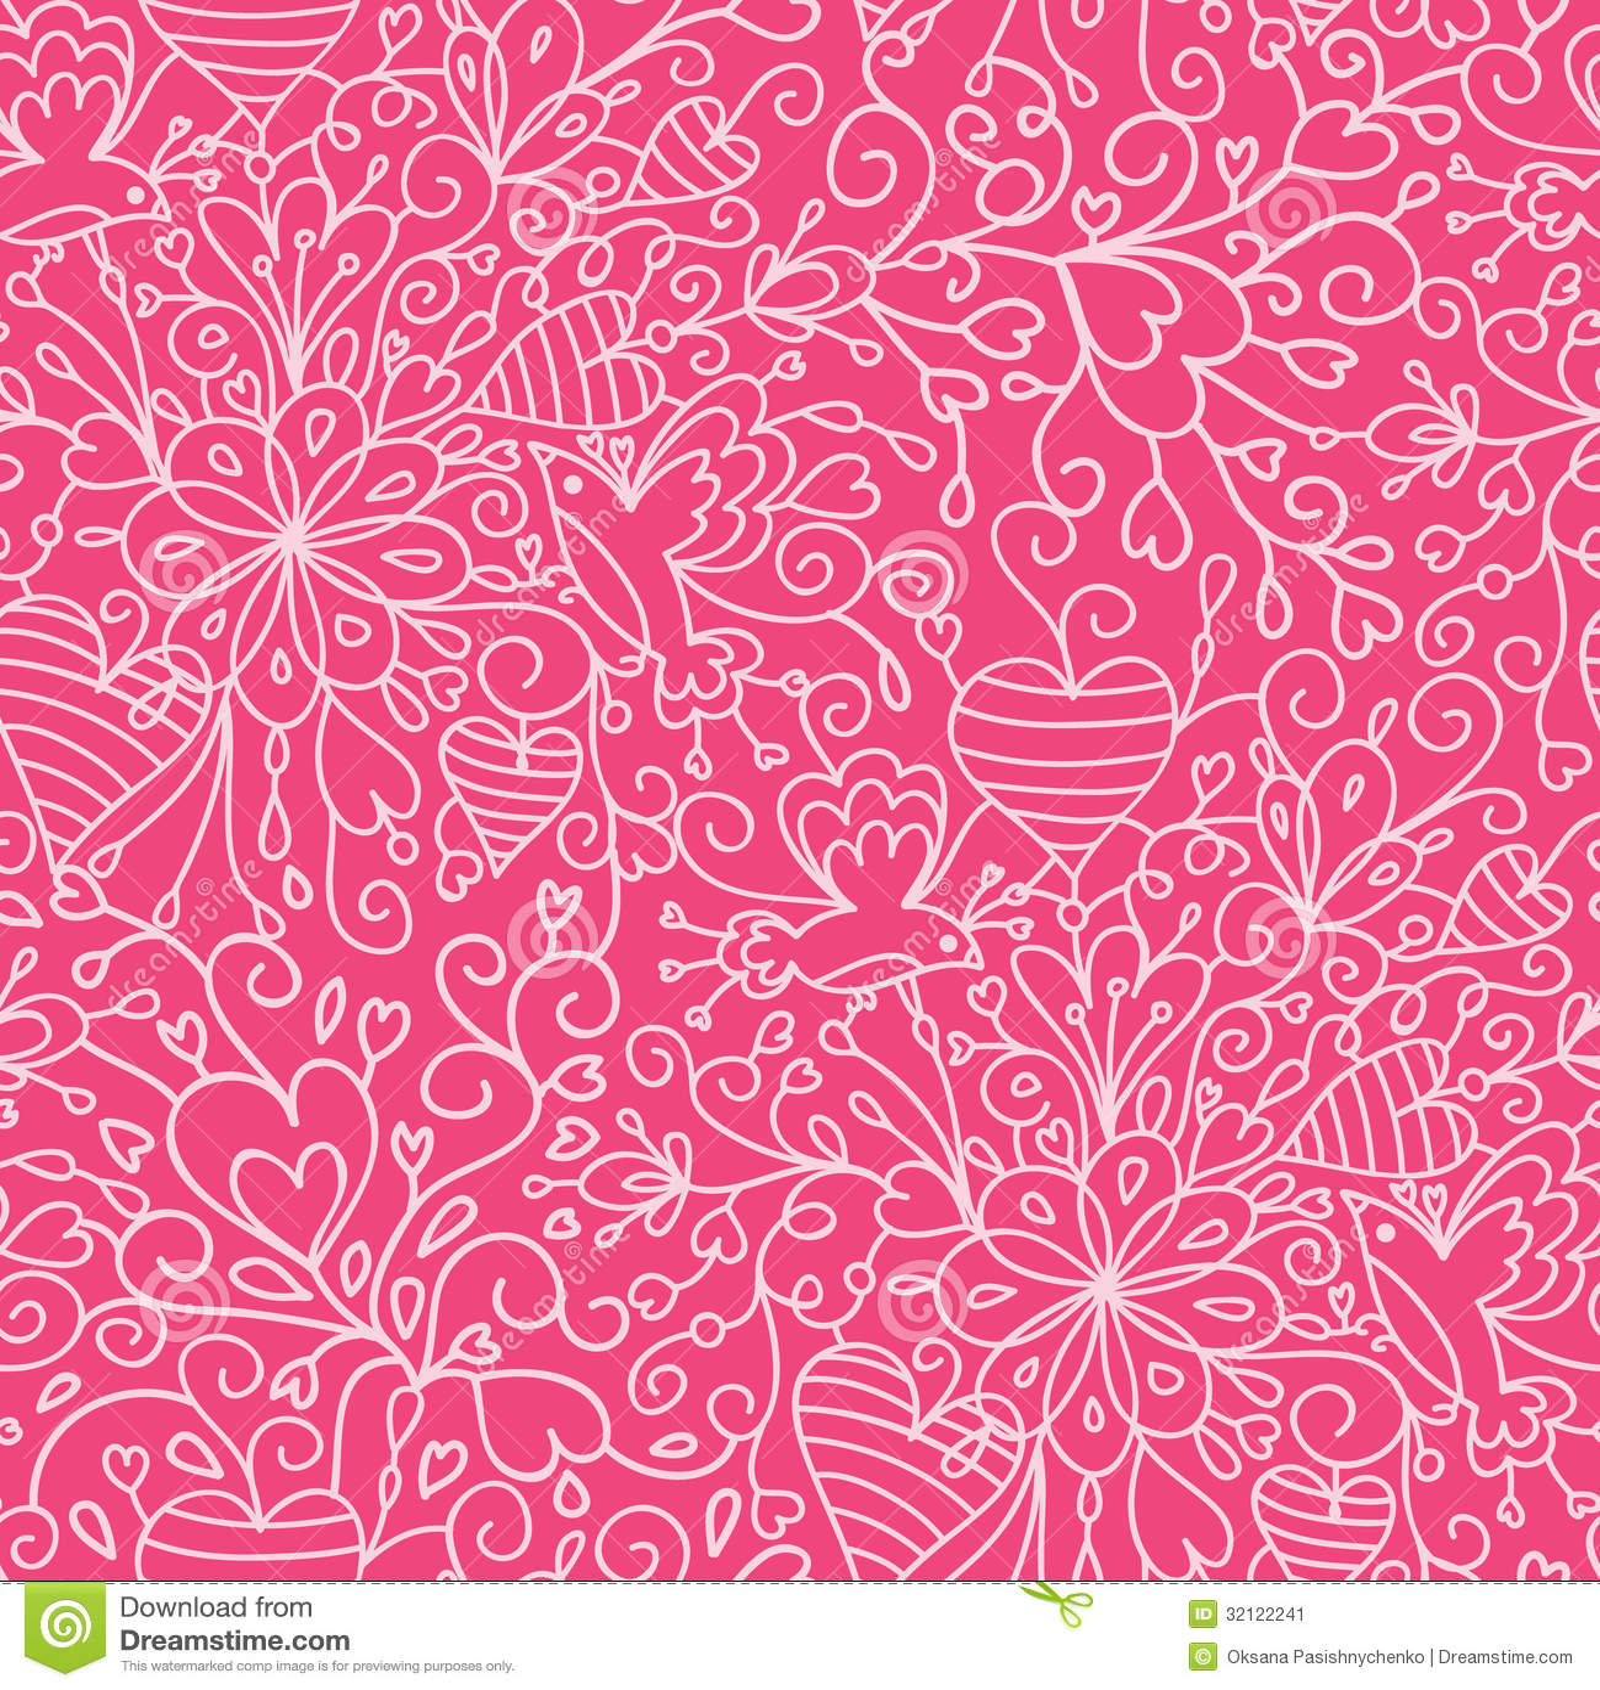 Animal Print Pink Wallpaper Romantic Garden Seamless Pattern Background Stock Vector